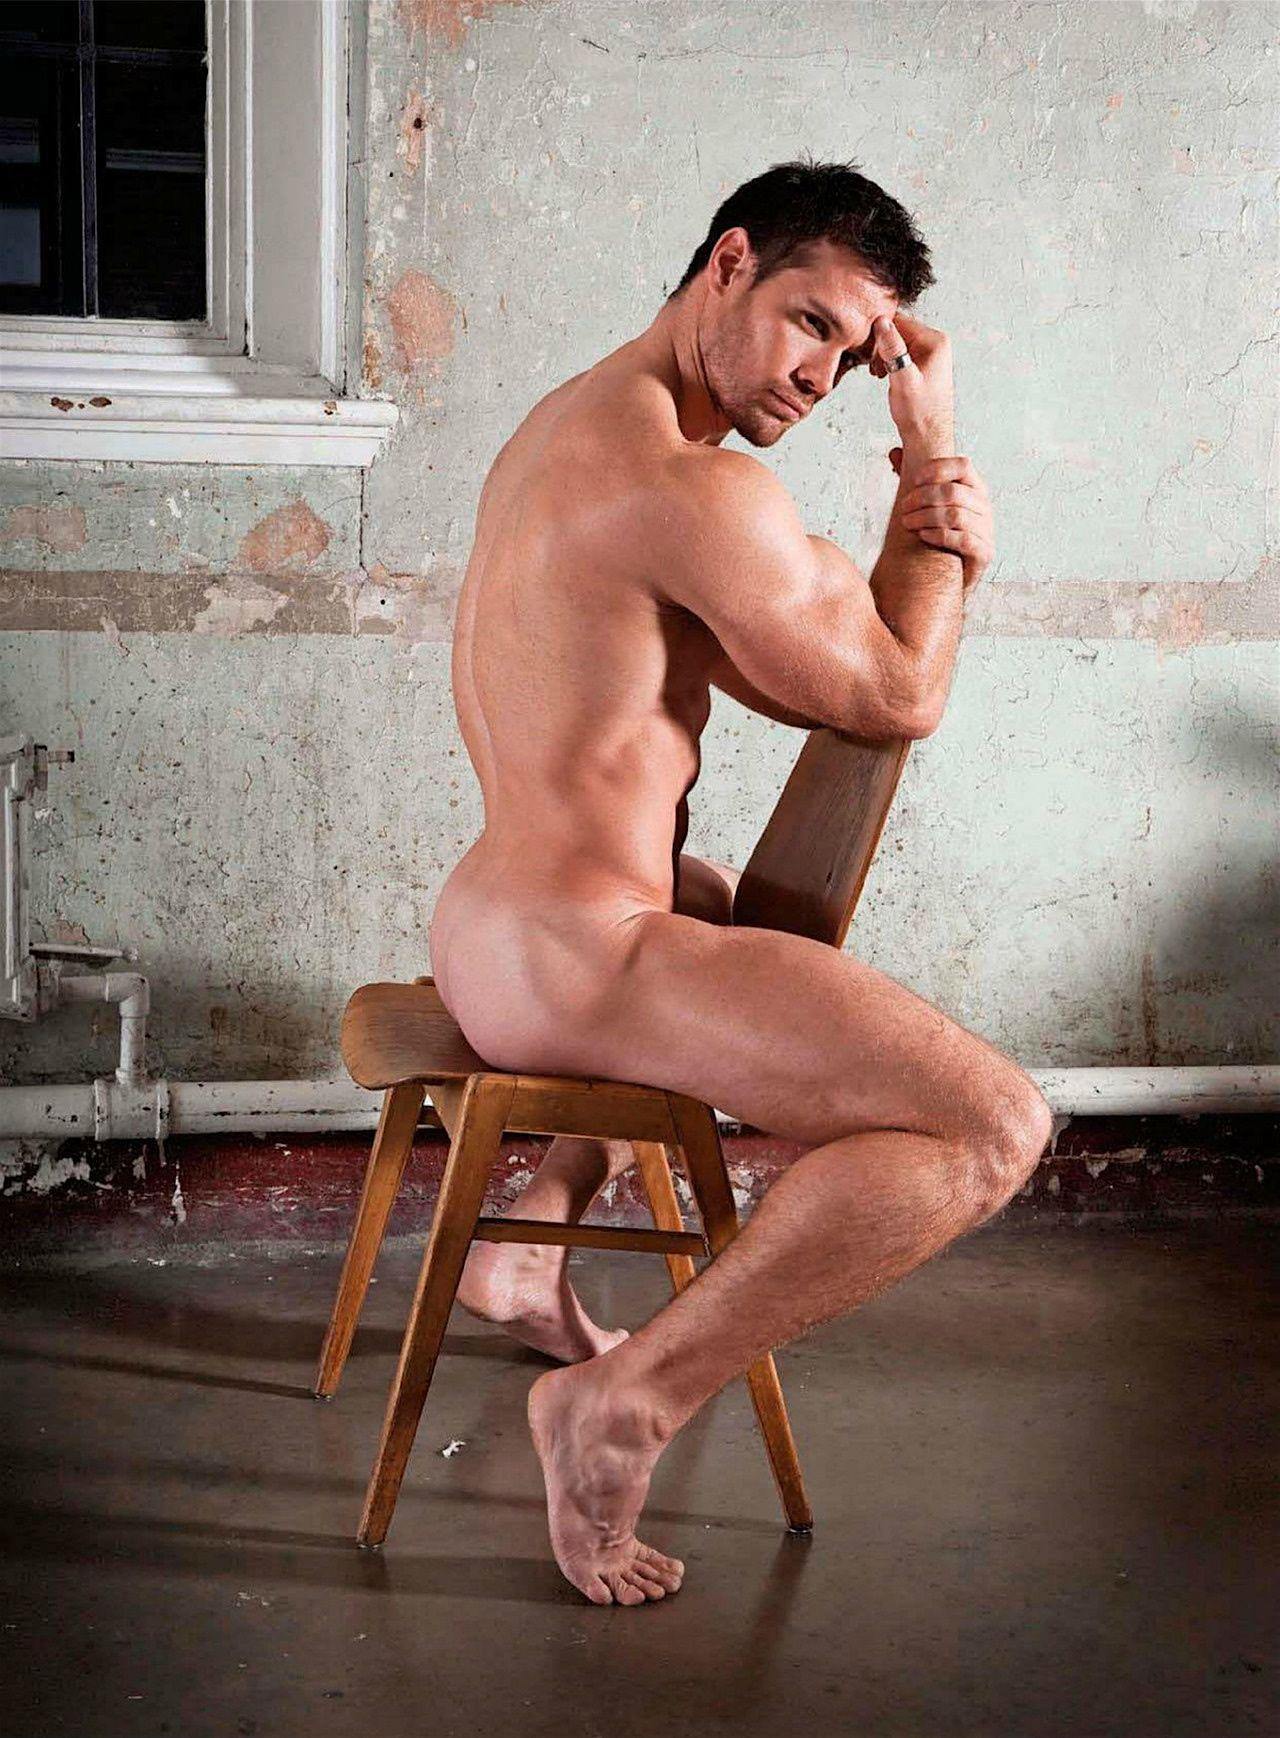 Pin by Lance Mulder on Bummm   Pinterest   Man body, Male ...